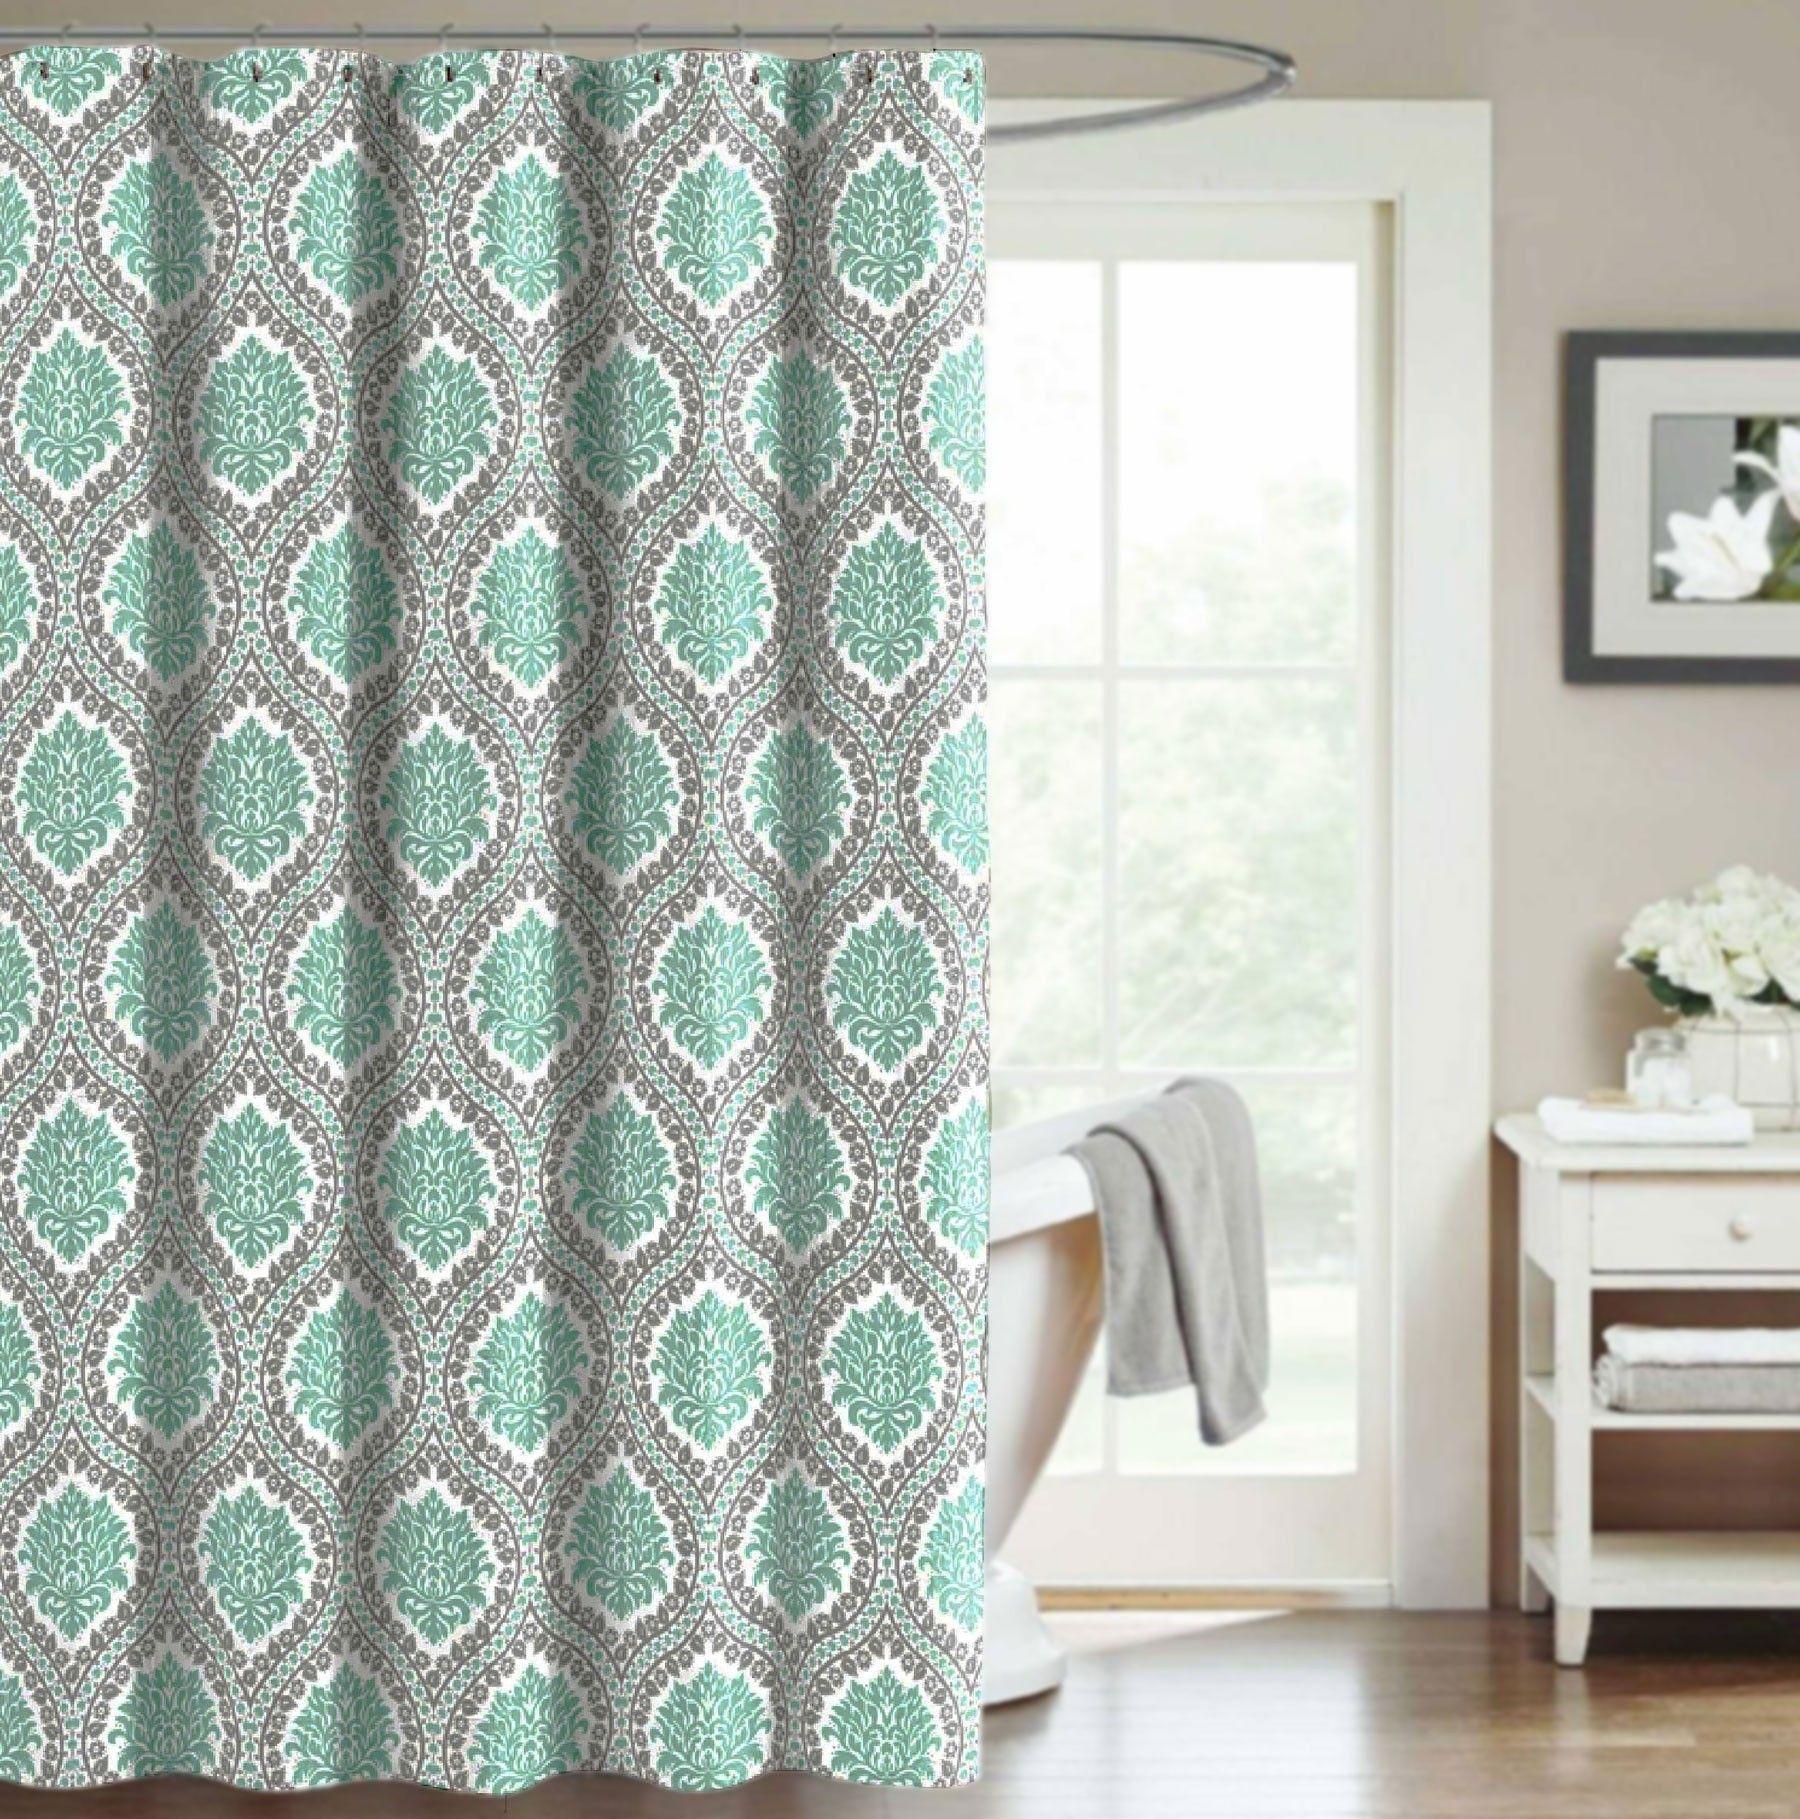 Delicieux Crest Home Bellavista Fabric Shower Curtain Teal Gray Medallion Damask U2013  Shower Curtains U2013 Bed U0026 Bath